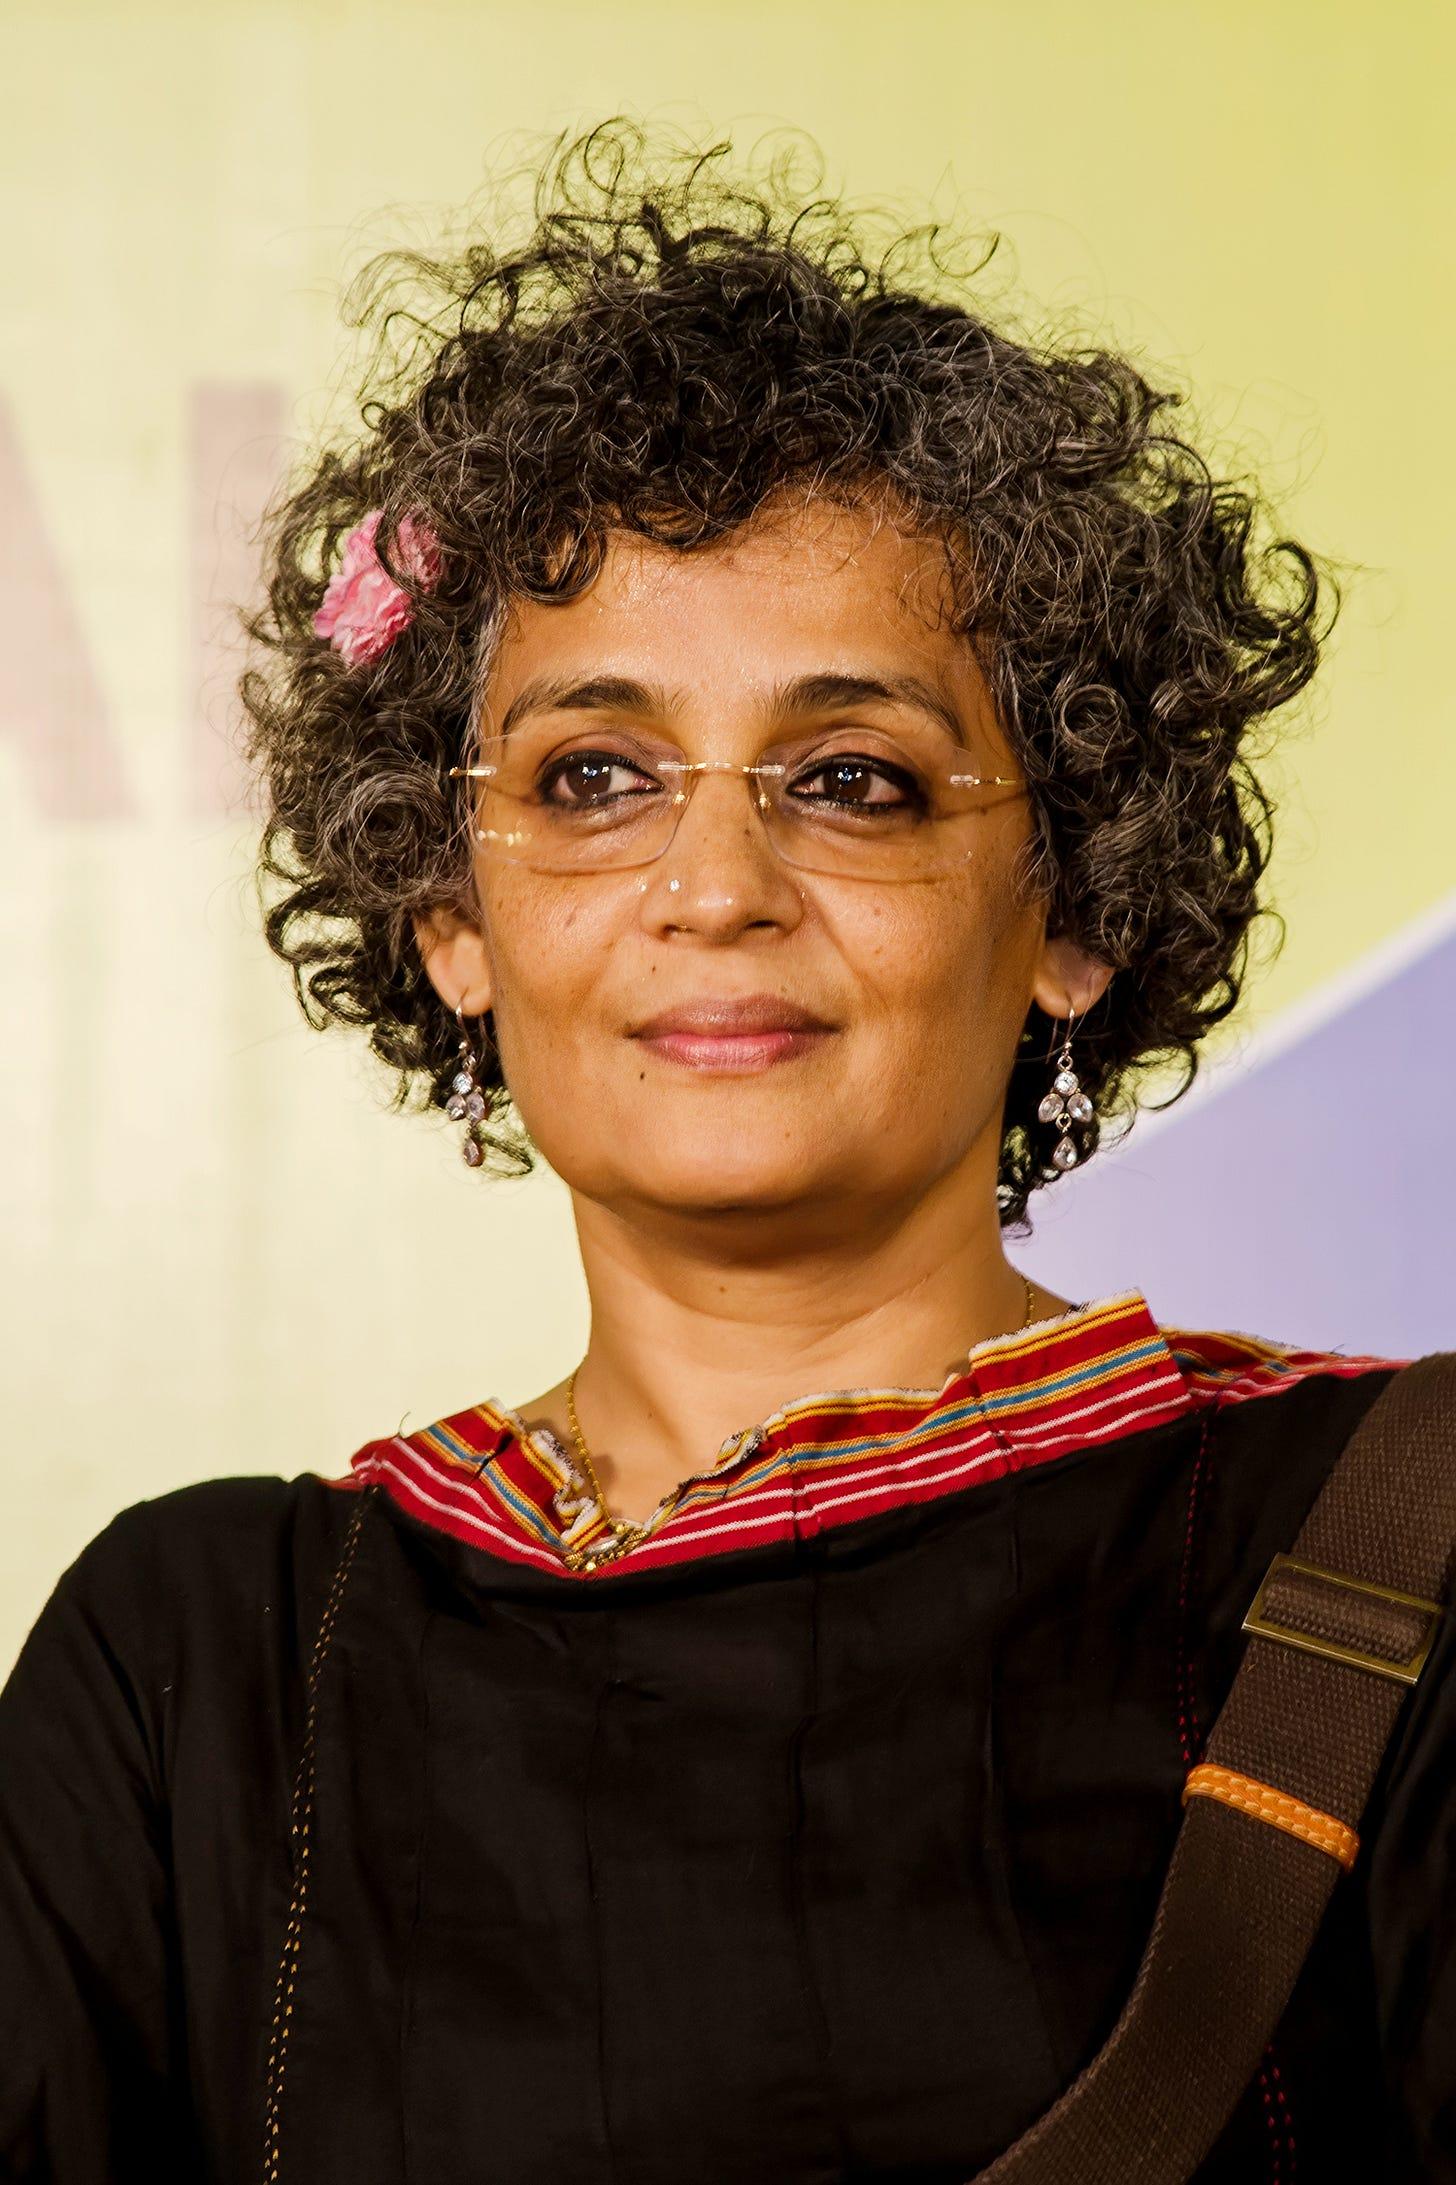 https://upload.wikimedia.org/wikipedia/commons/7/7b/Arundhati_Roy_W.jpg